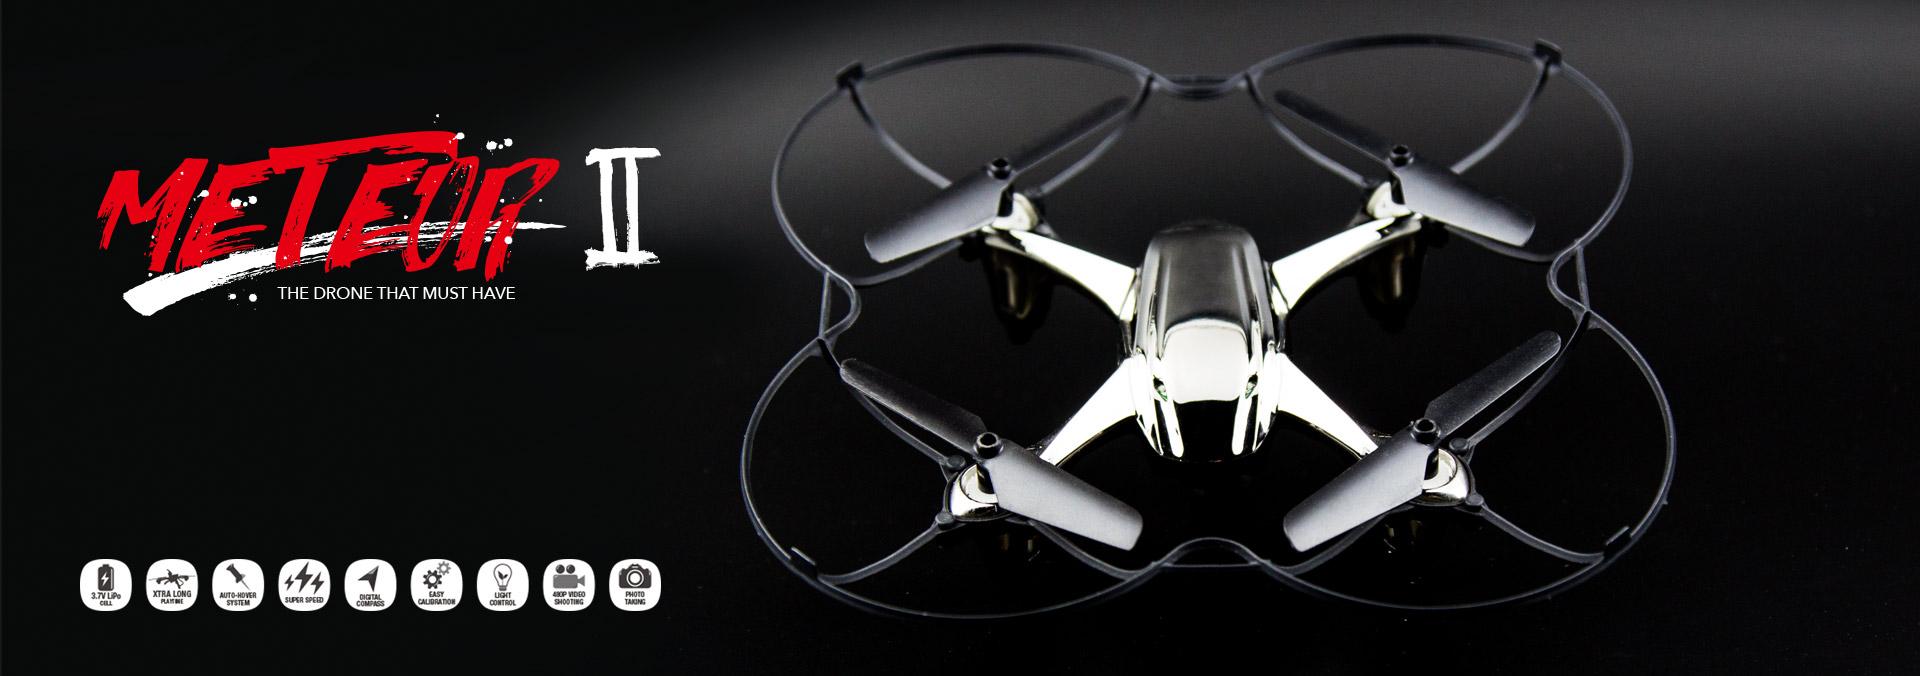 Meteor drone main-2